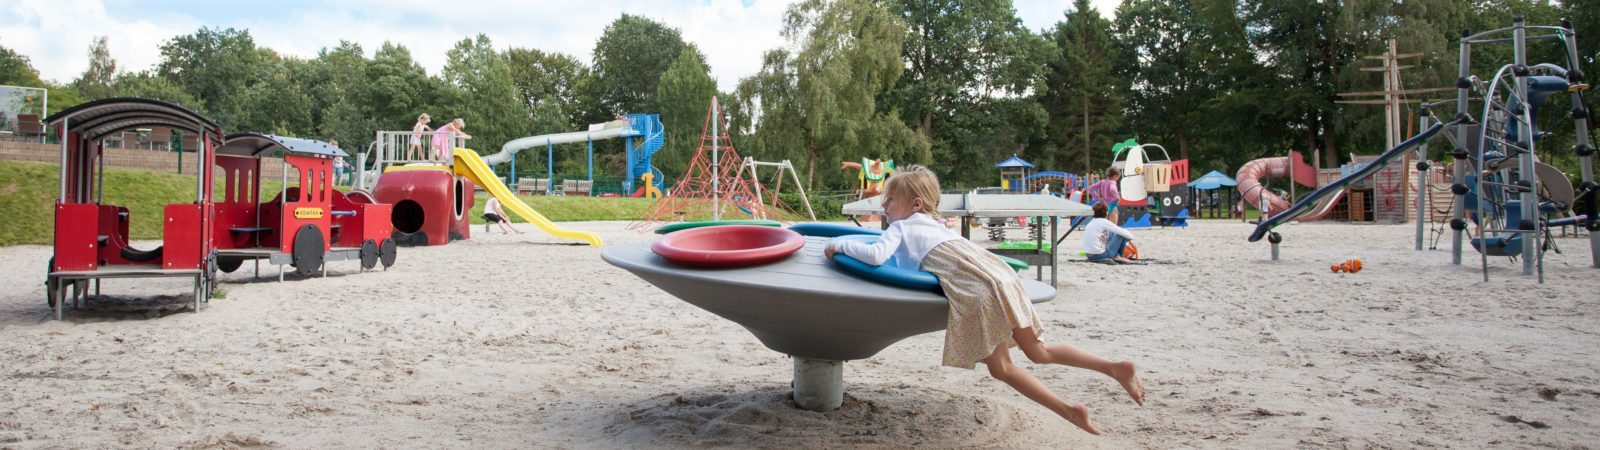 Speeltuinen | Vakantiepark Witterzomer